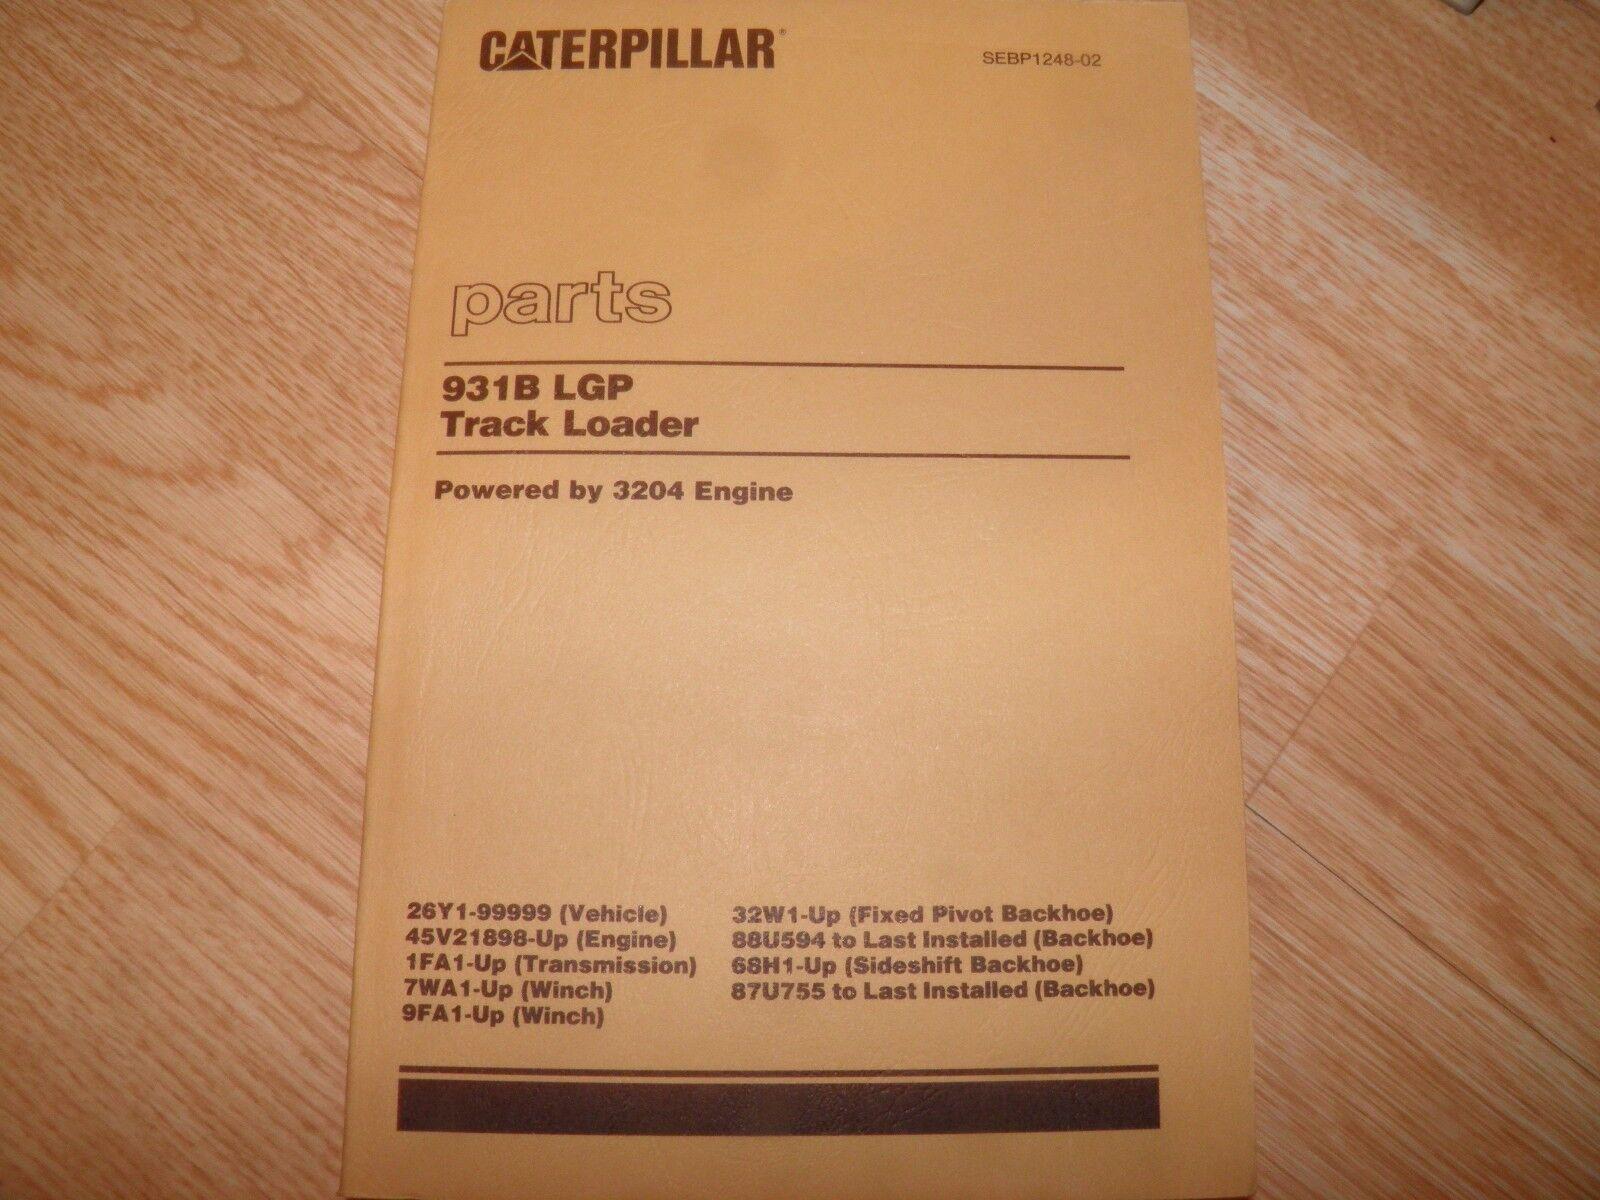 Caterpillar 931B Backhoe Attachment Service Manual S/N 32W1, 68H1 ...